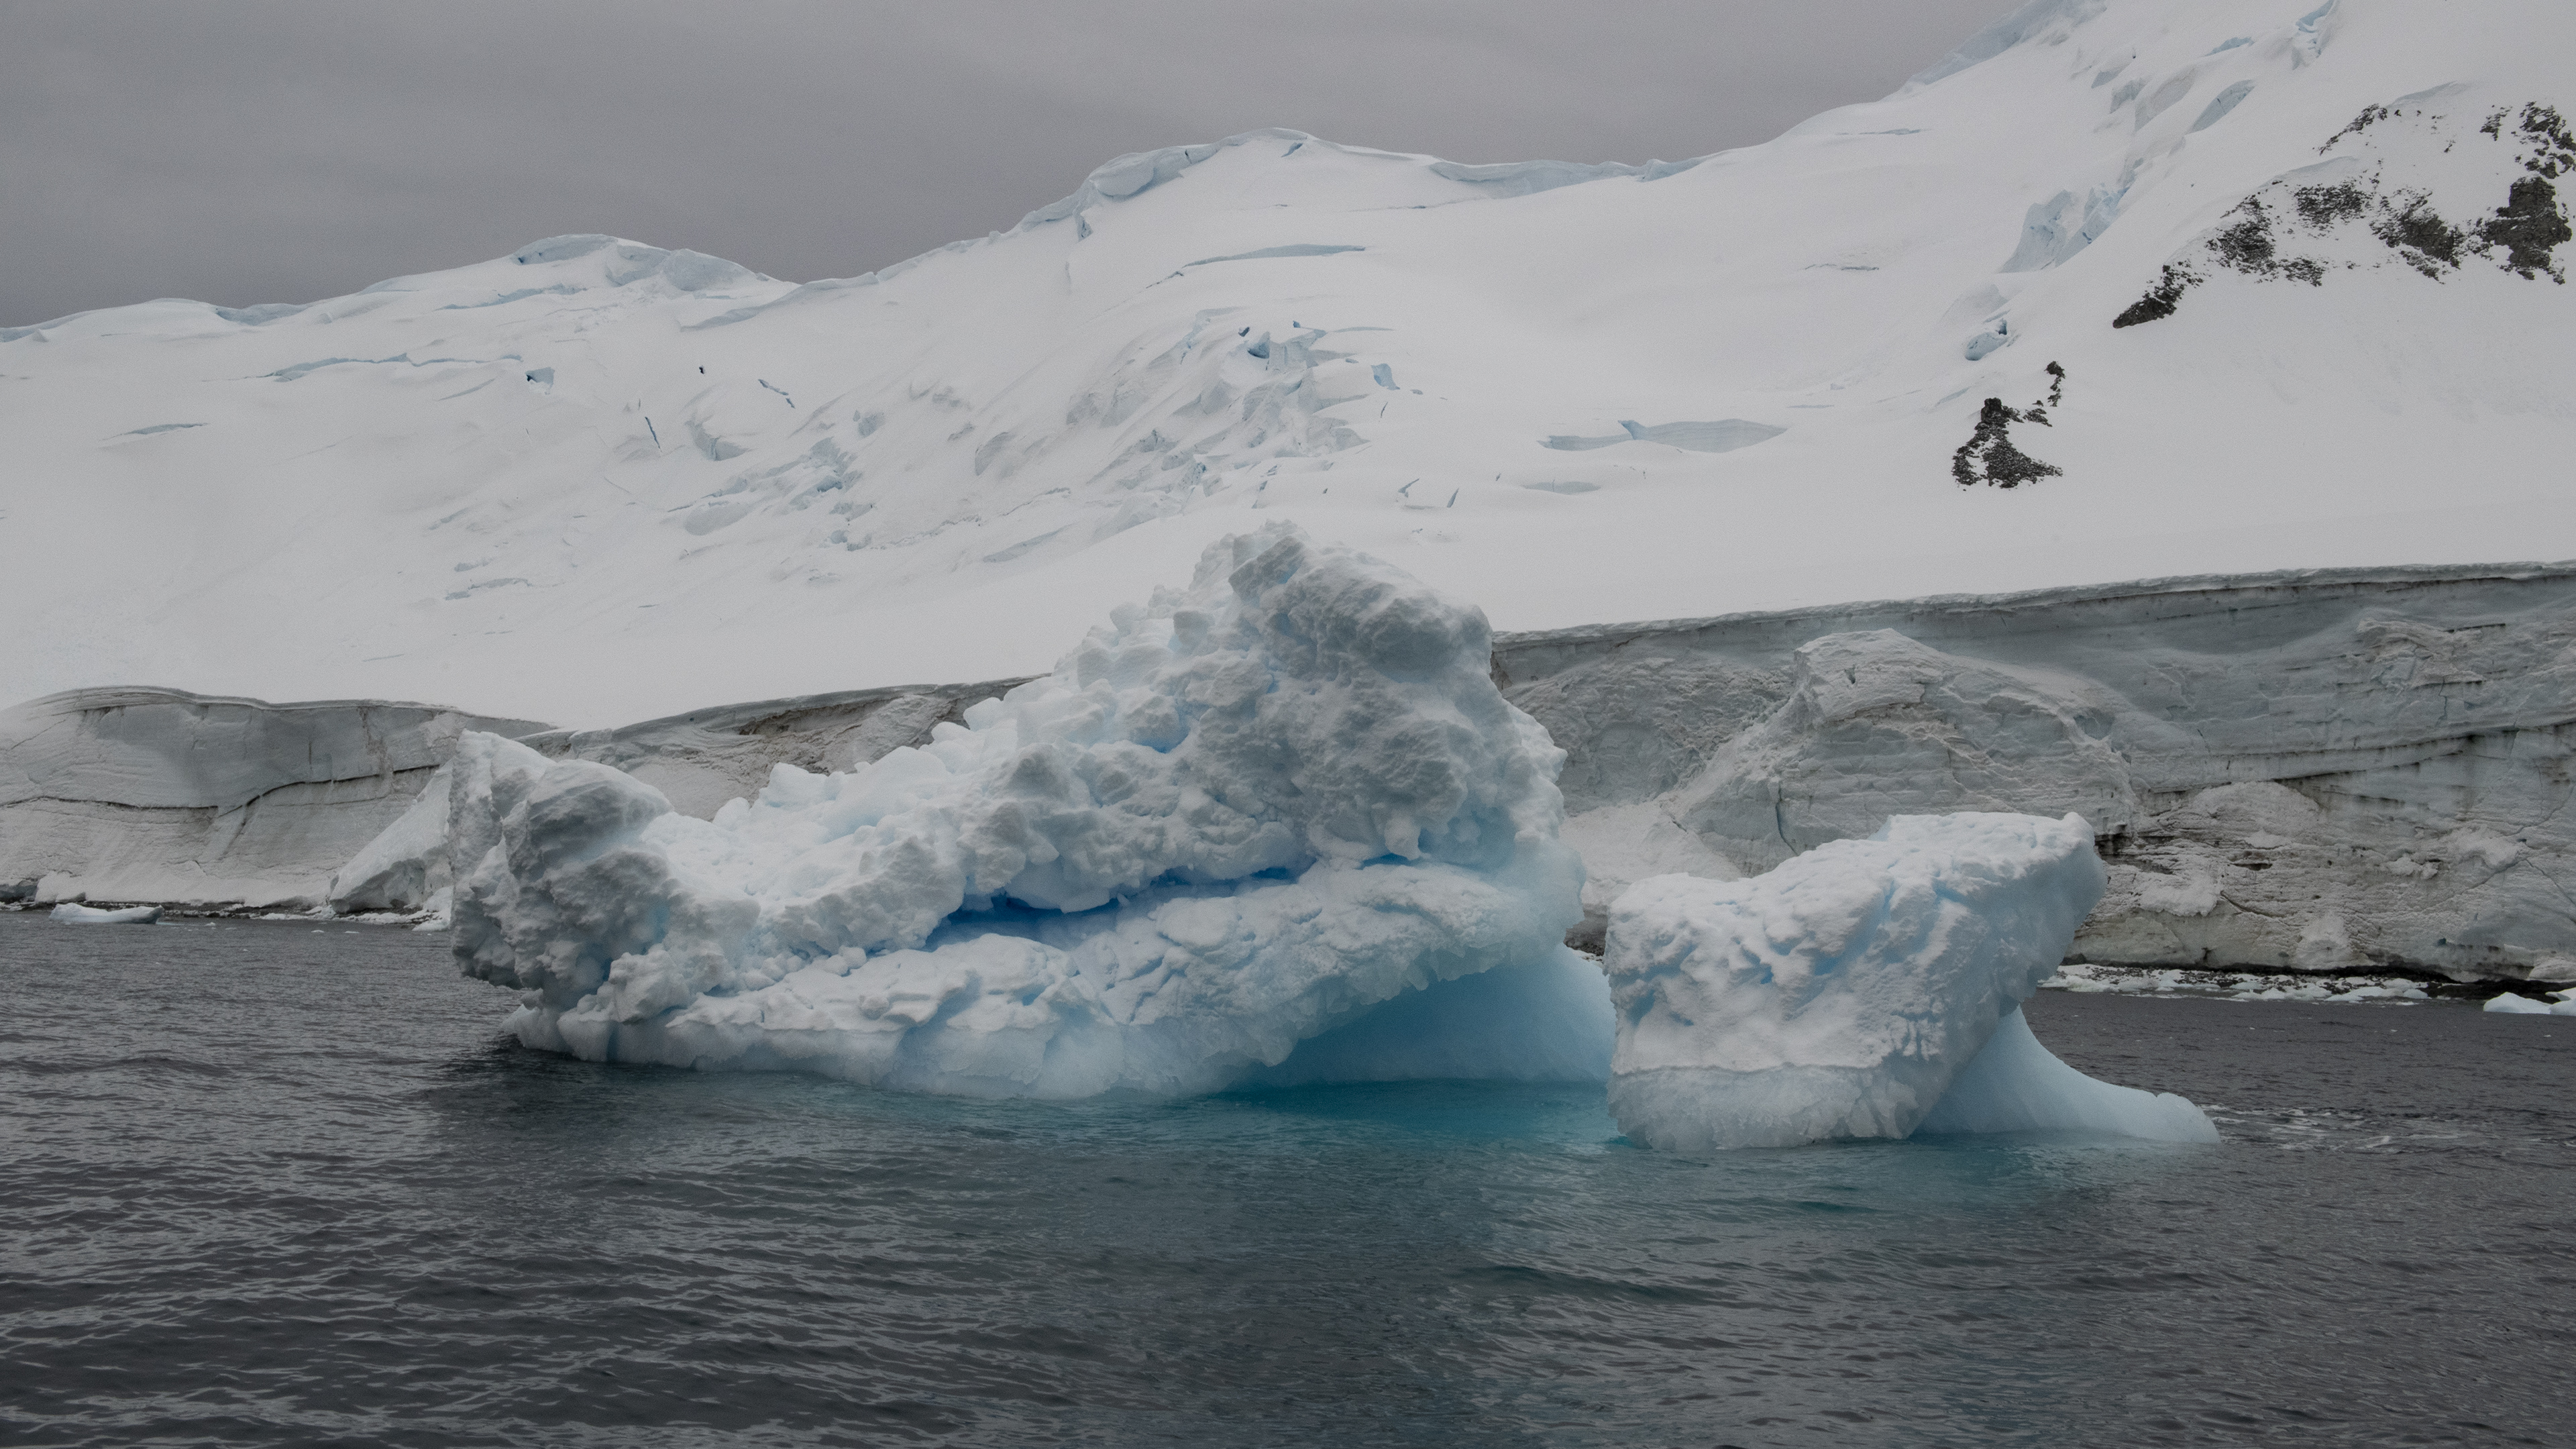 Blue Ice near Astrolabe lsland